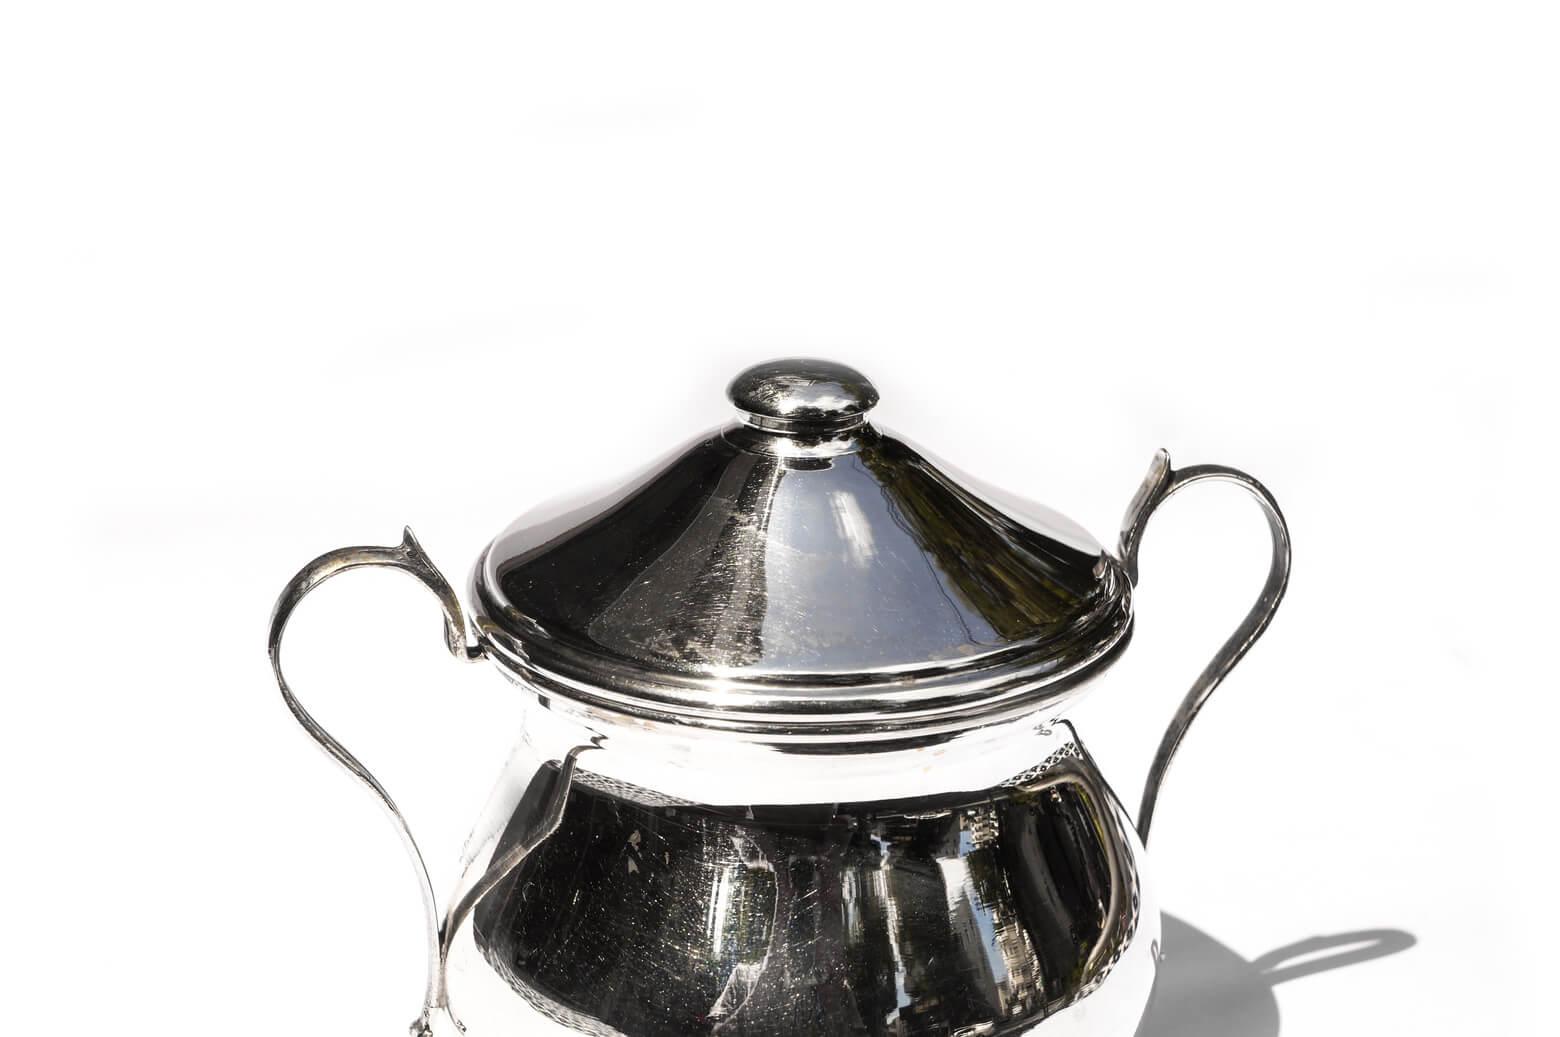 Euro Vintage Silver Sugar Pot/ヨーロッパ ヴィンテージ シルバー800 シュガーポット 銀食器 アンティーク雑貨